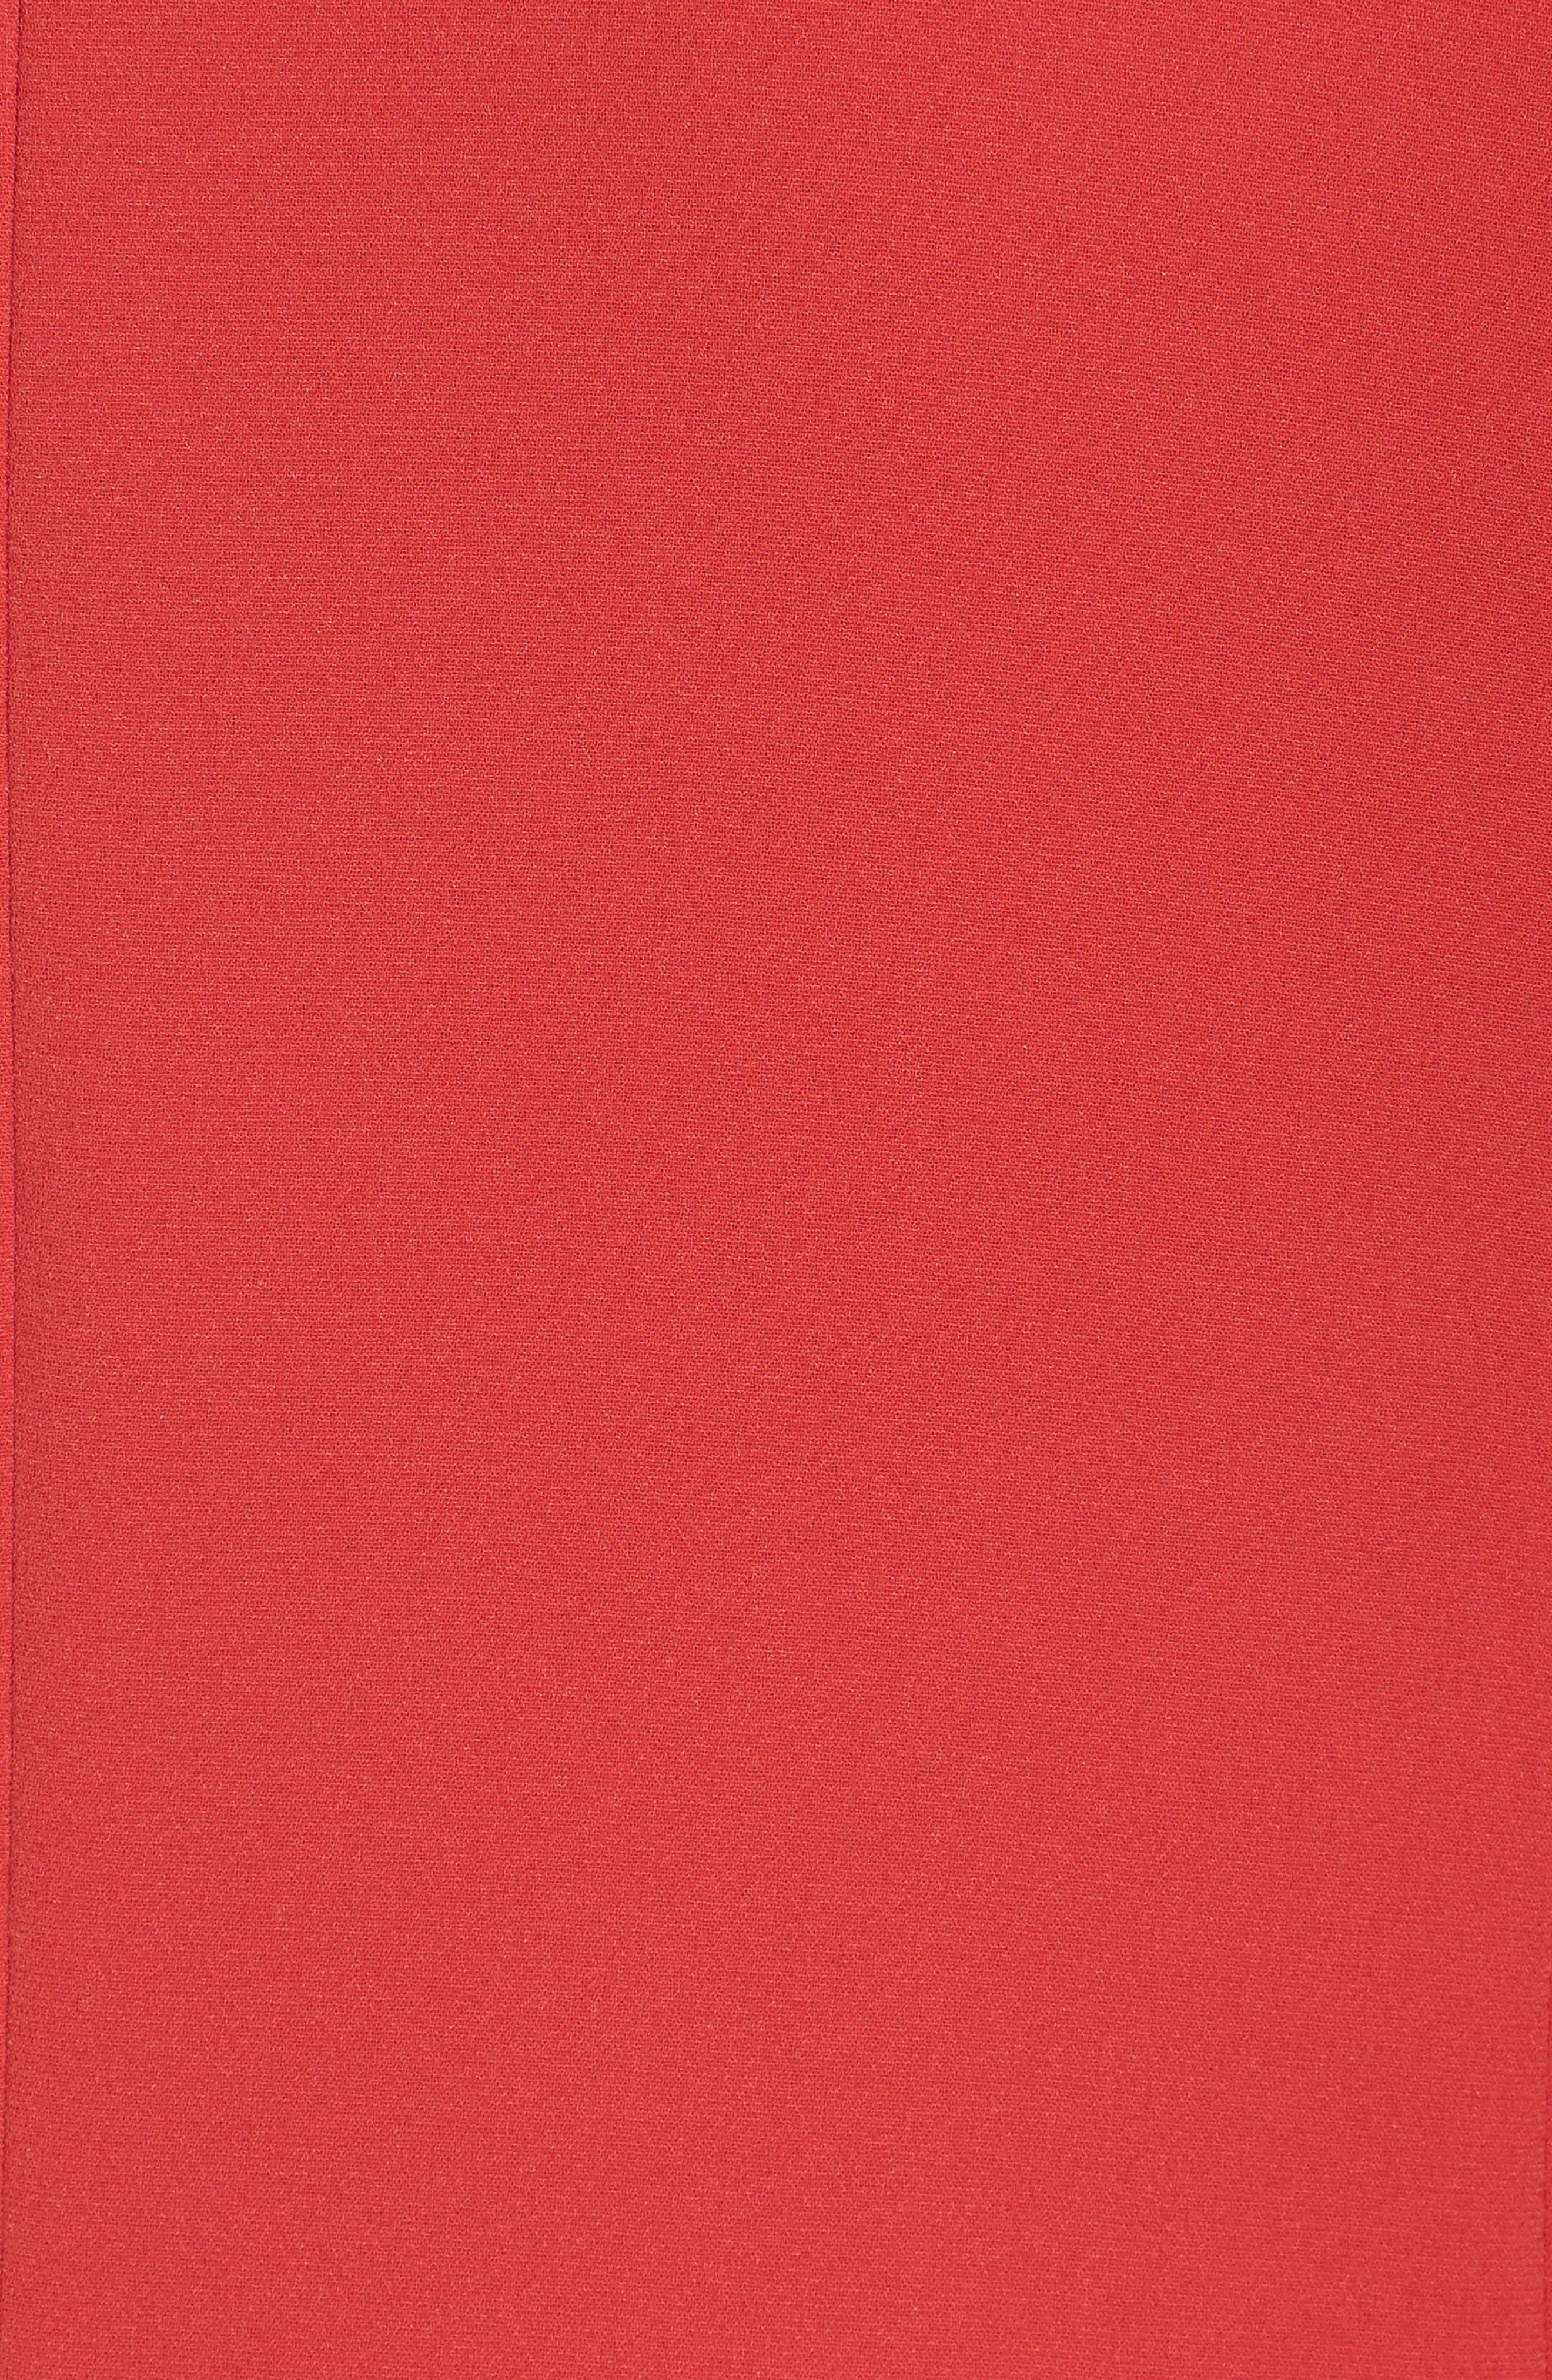 Bria Finesse Crepe Jacket,                             Alternate thumbnail 6, color,                             604